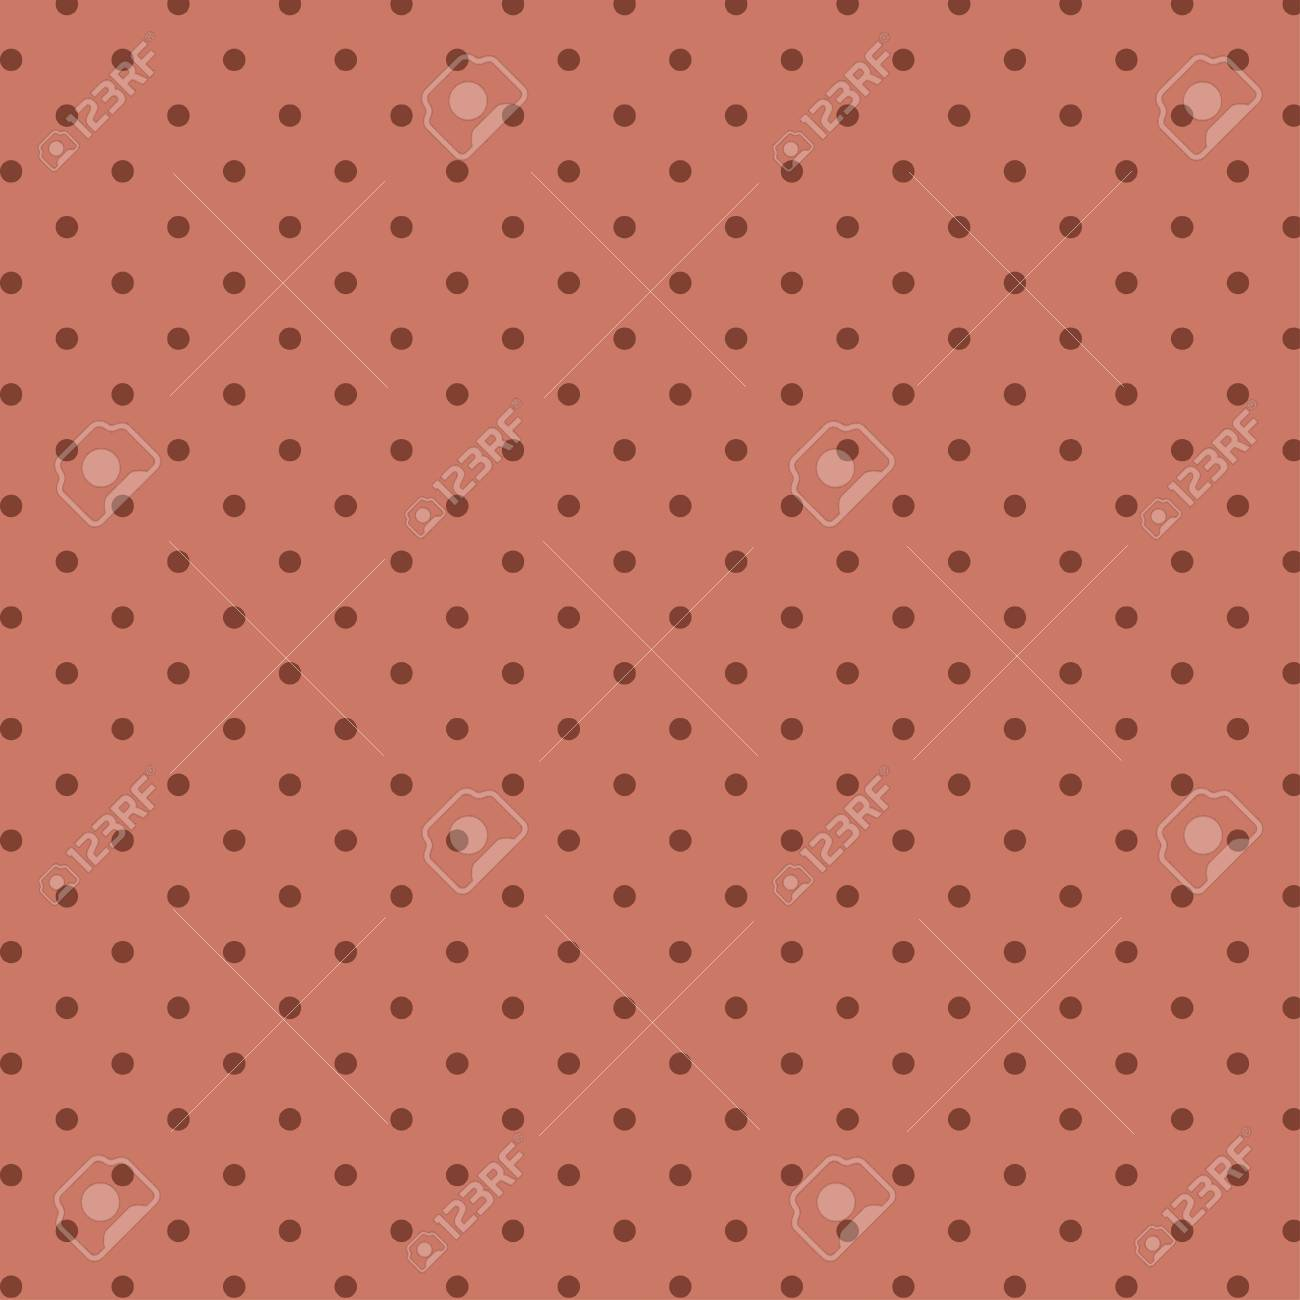 Polka dot background pattern - 114708503